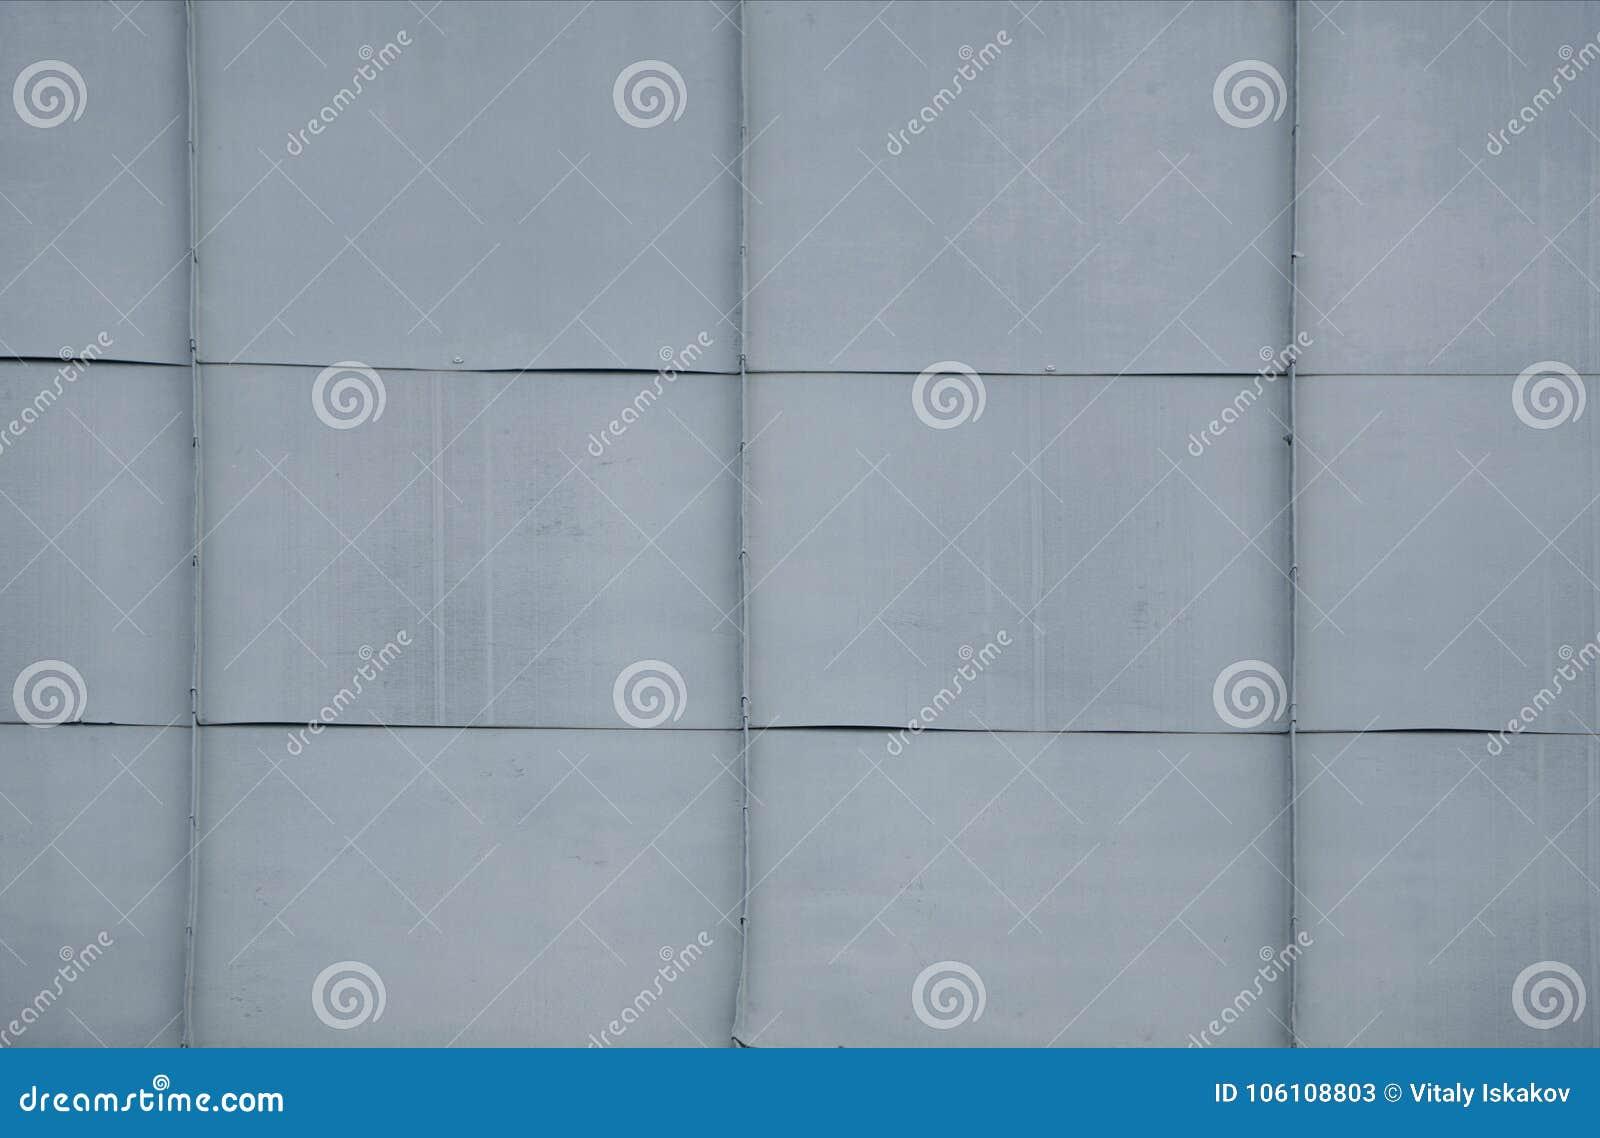 Roof floor tiles design best roof 2018 floor design astounding garage ideas using black white red dailygadgetfo Choice Image